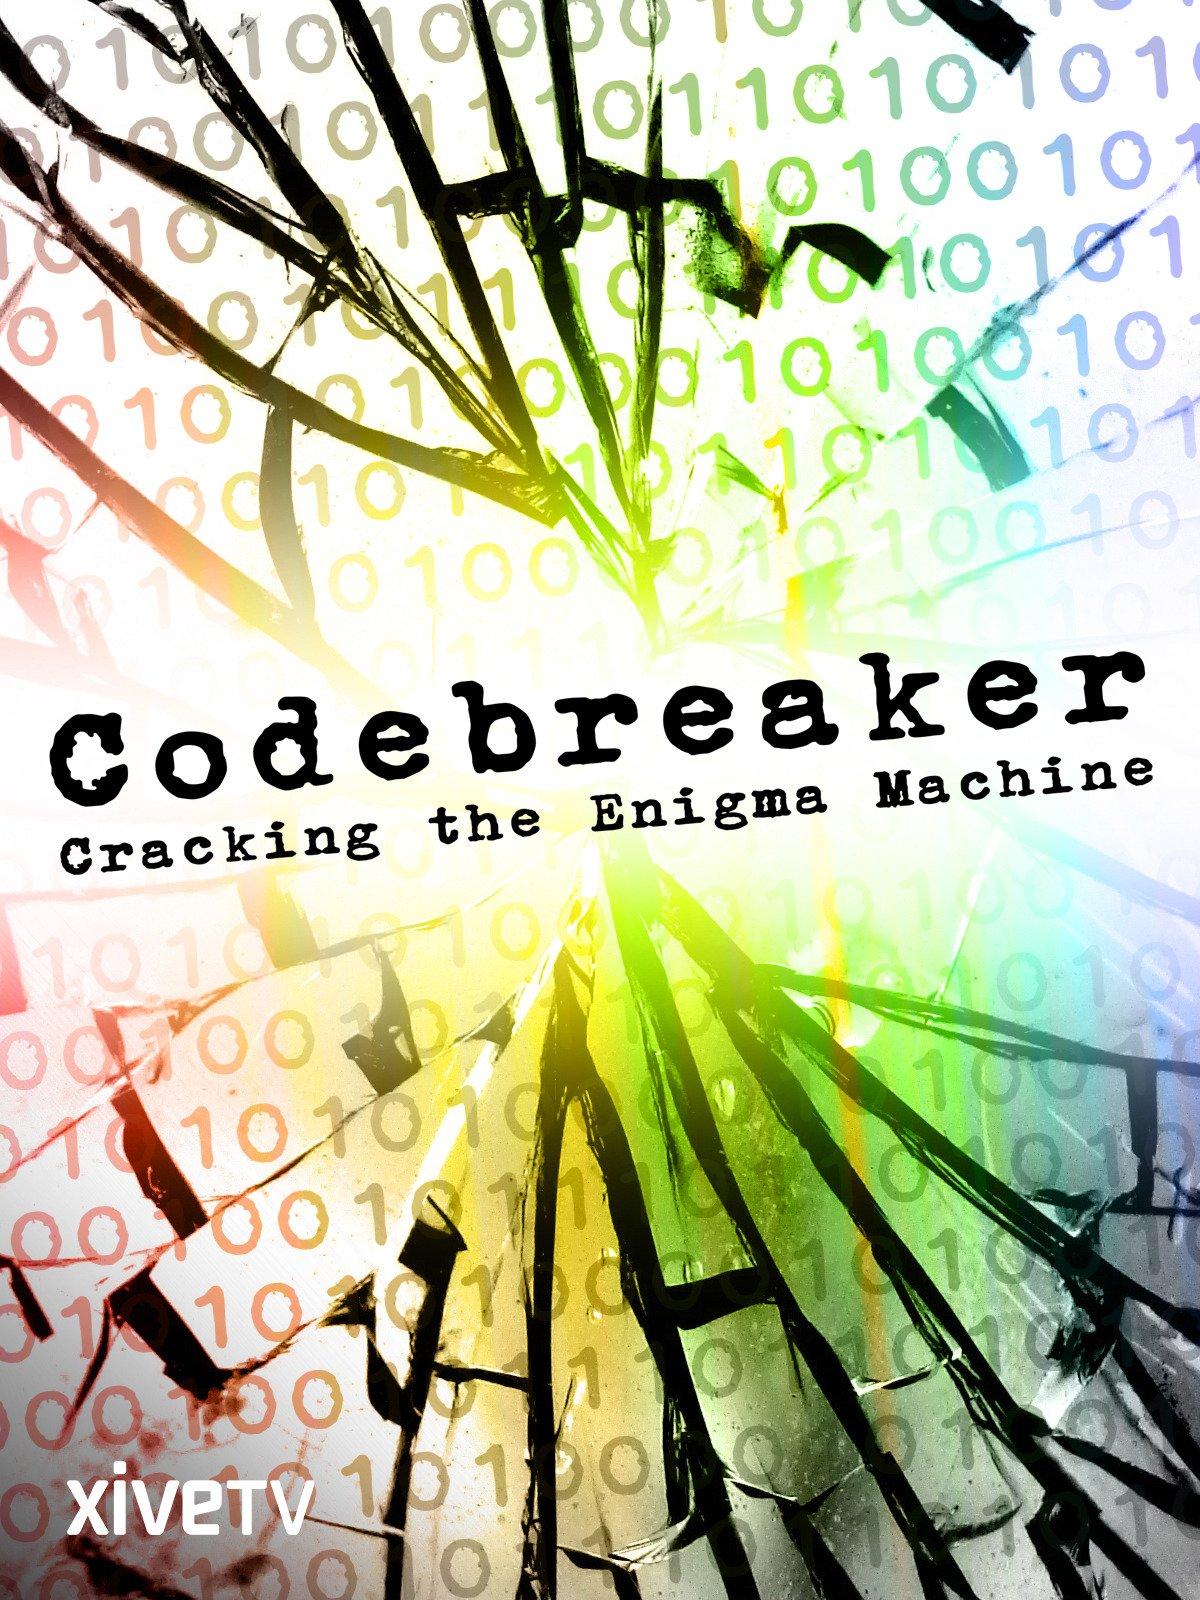 Amazon com: Watch Codebreaker: Cracking the Enigma Machine | Prime Video